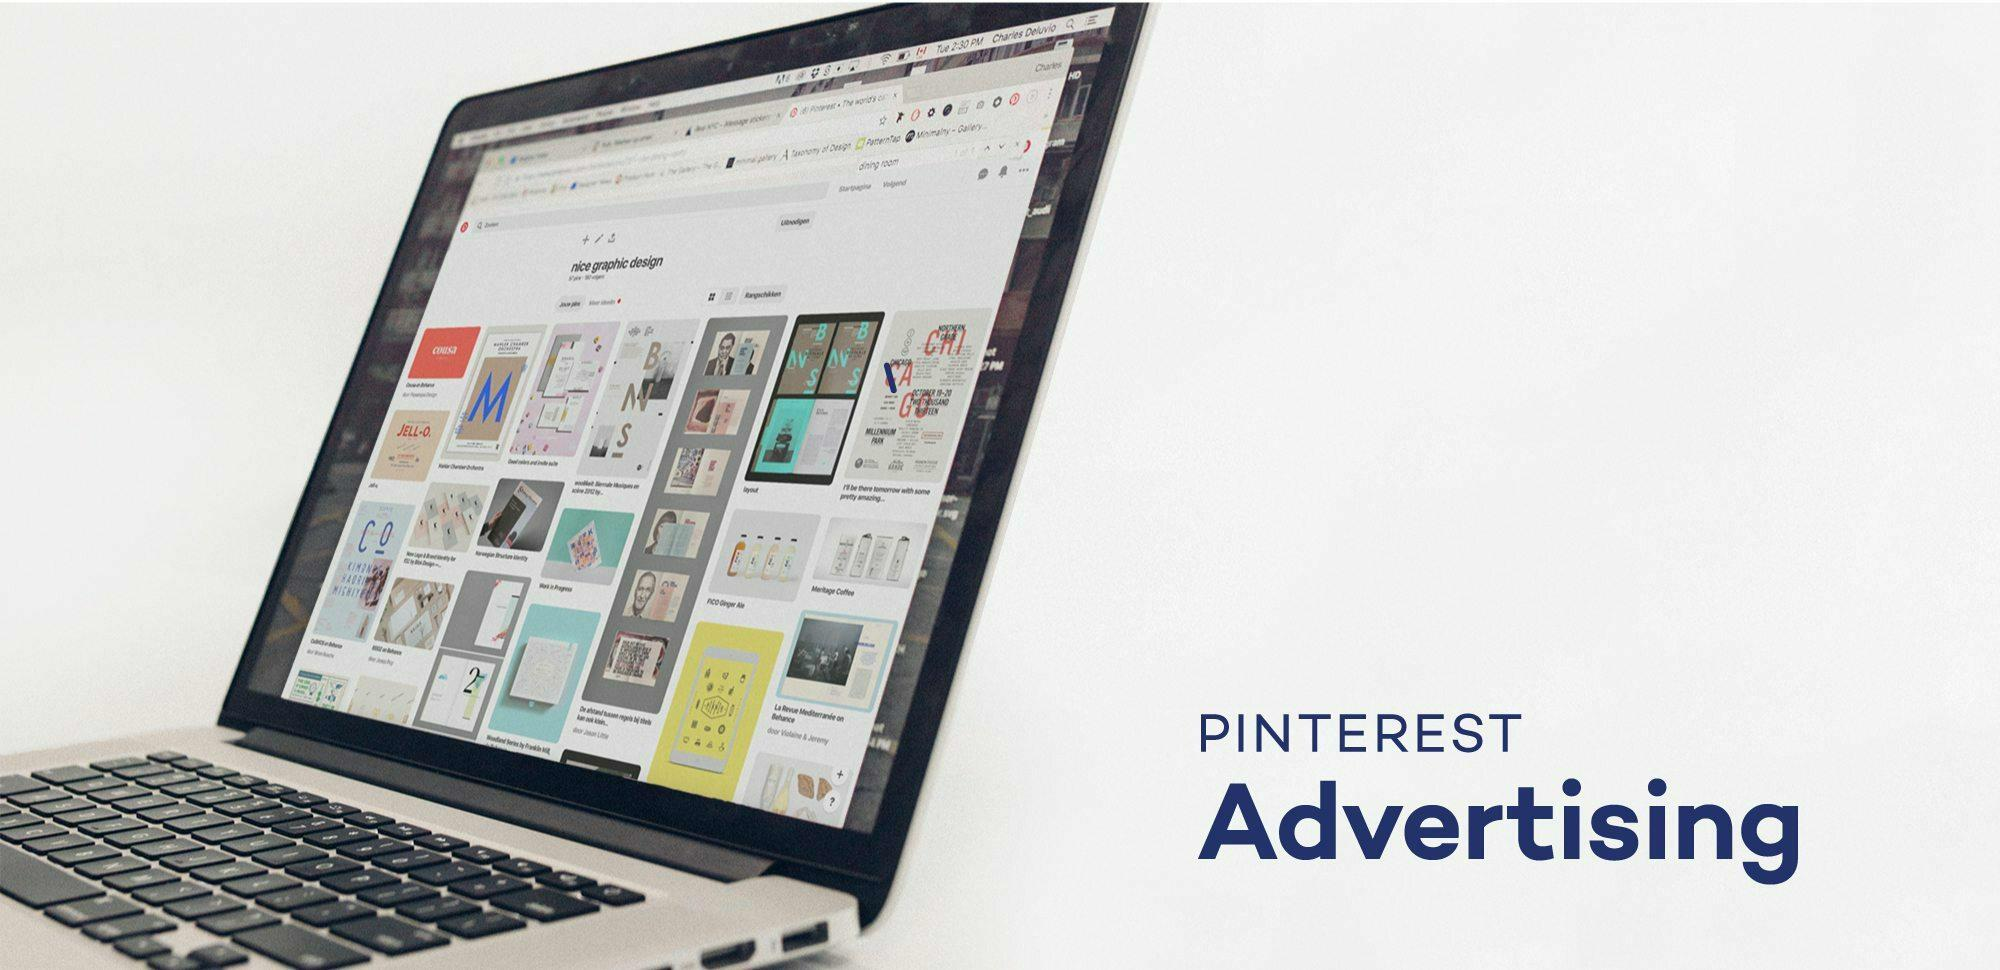 Pinterest advertising: dit is waarom je Pinterest ads moet opzetten